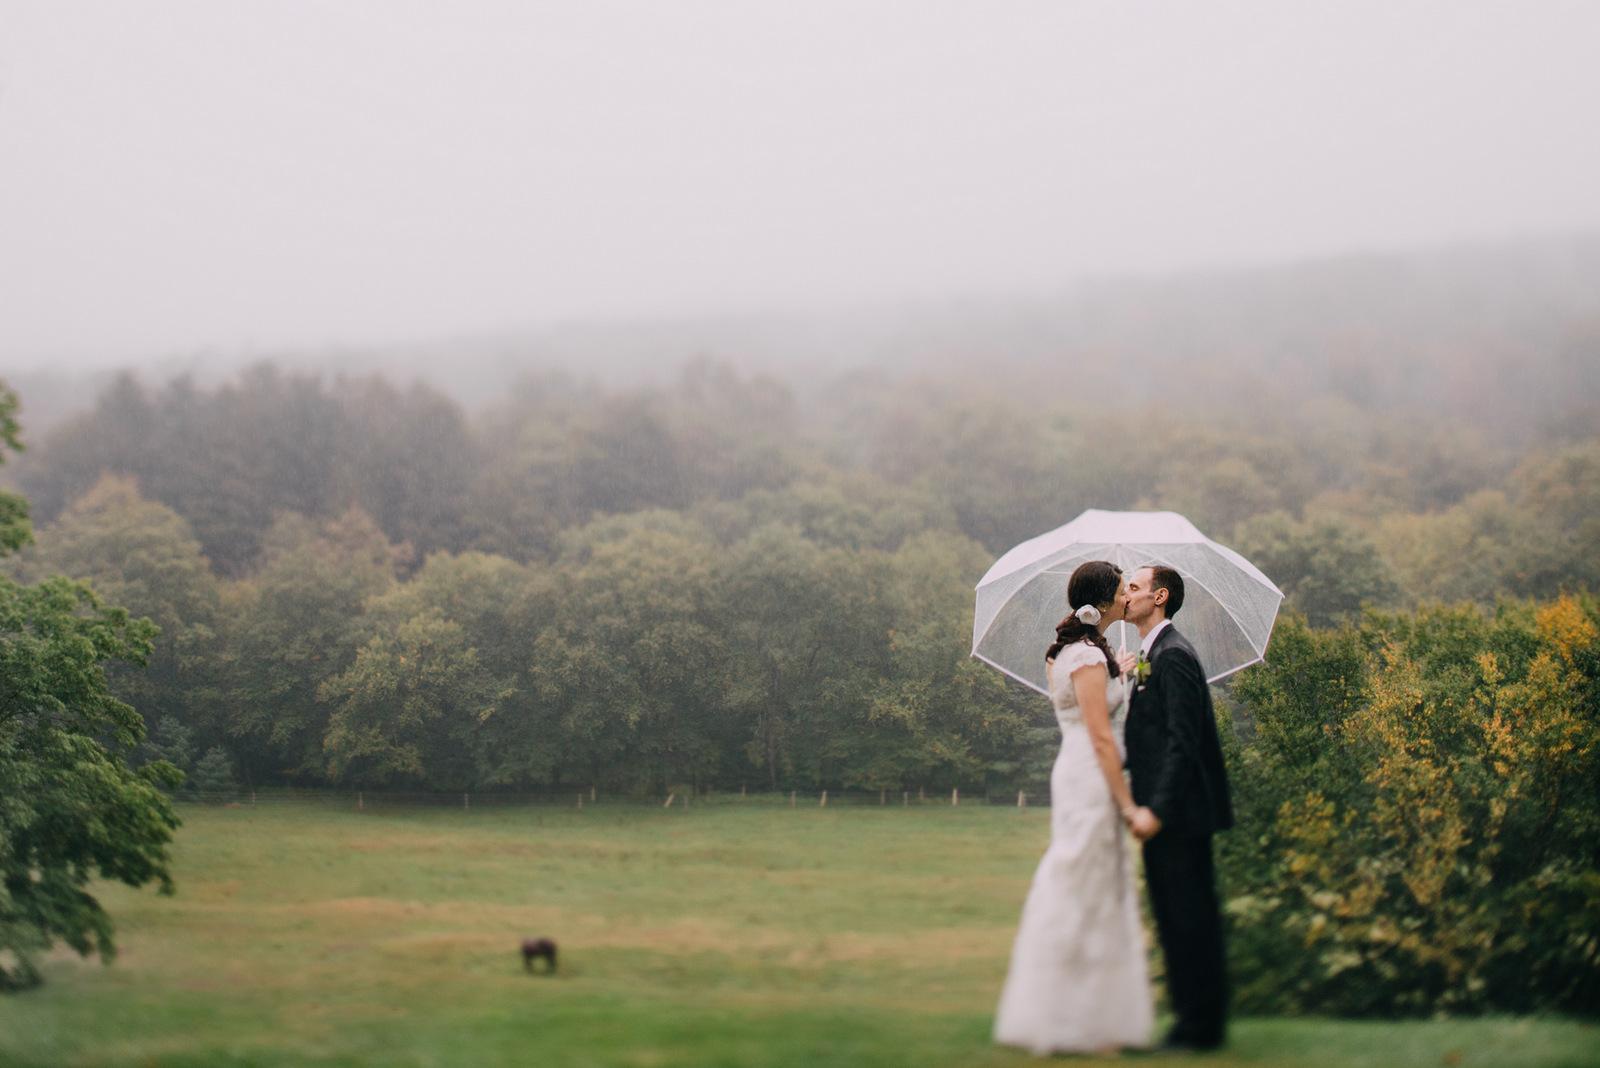 15-Emily Tebbetts Wedding Photography 6261--2.jpg